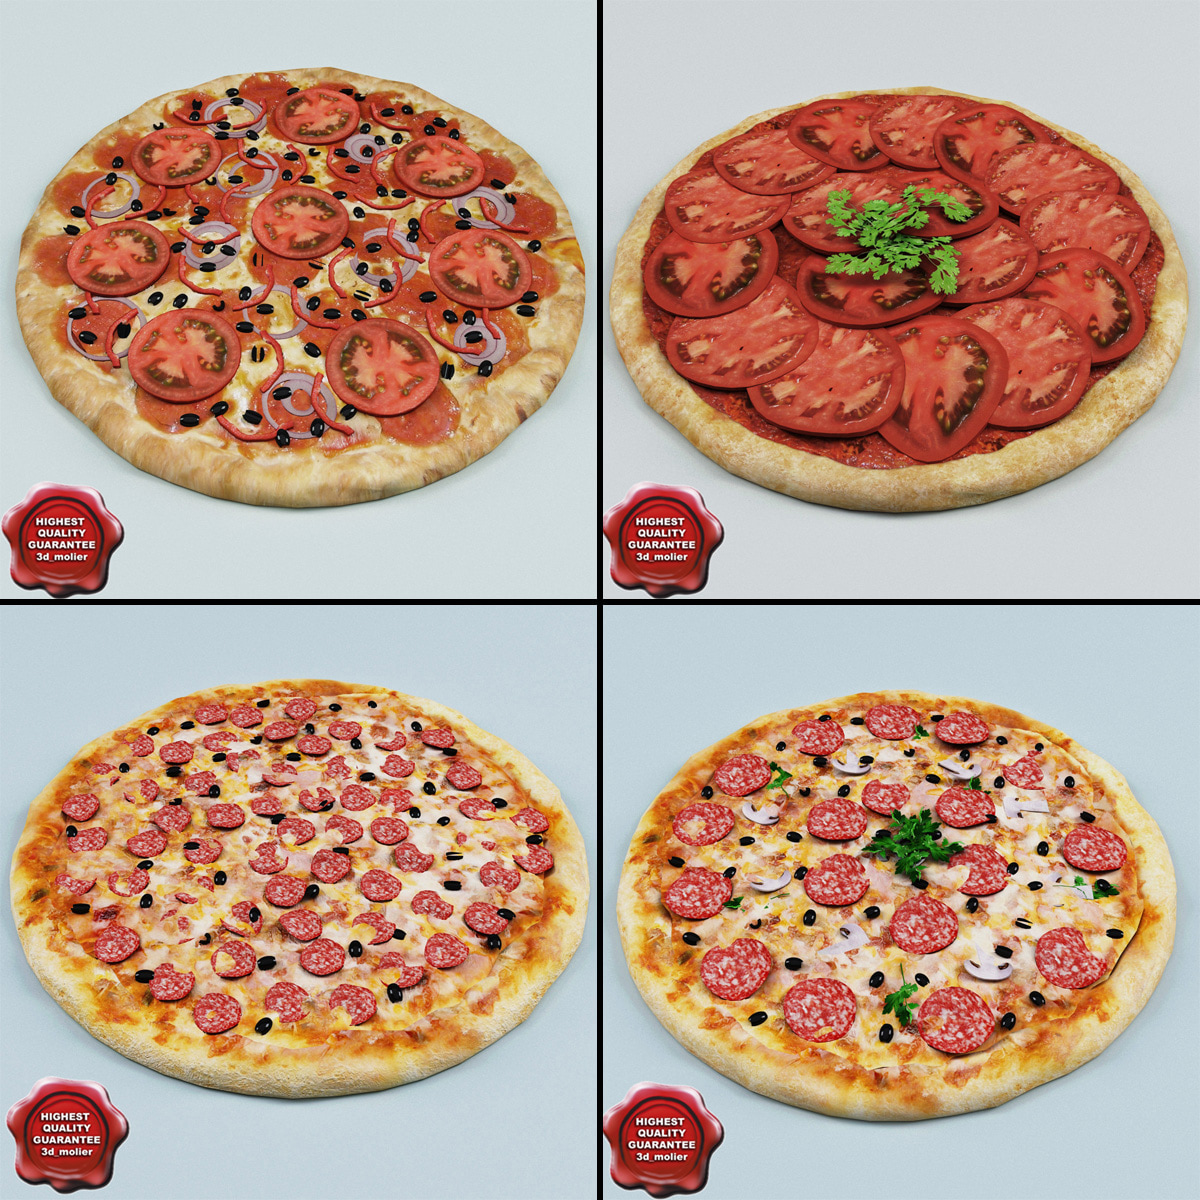 3d model pizzas modelled